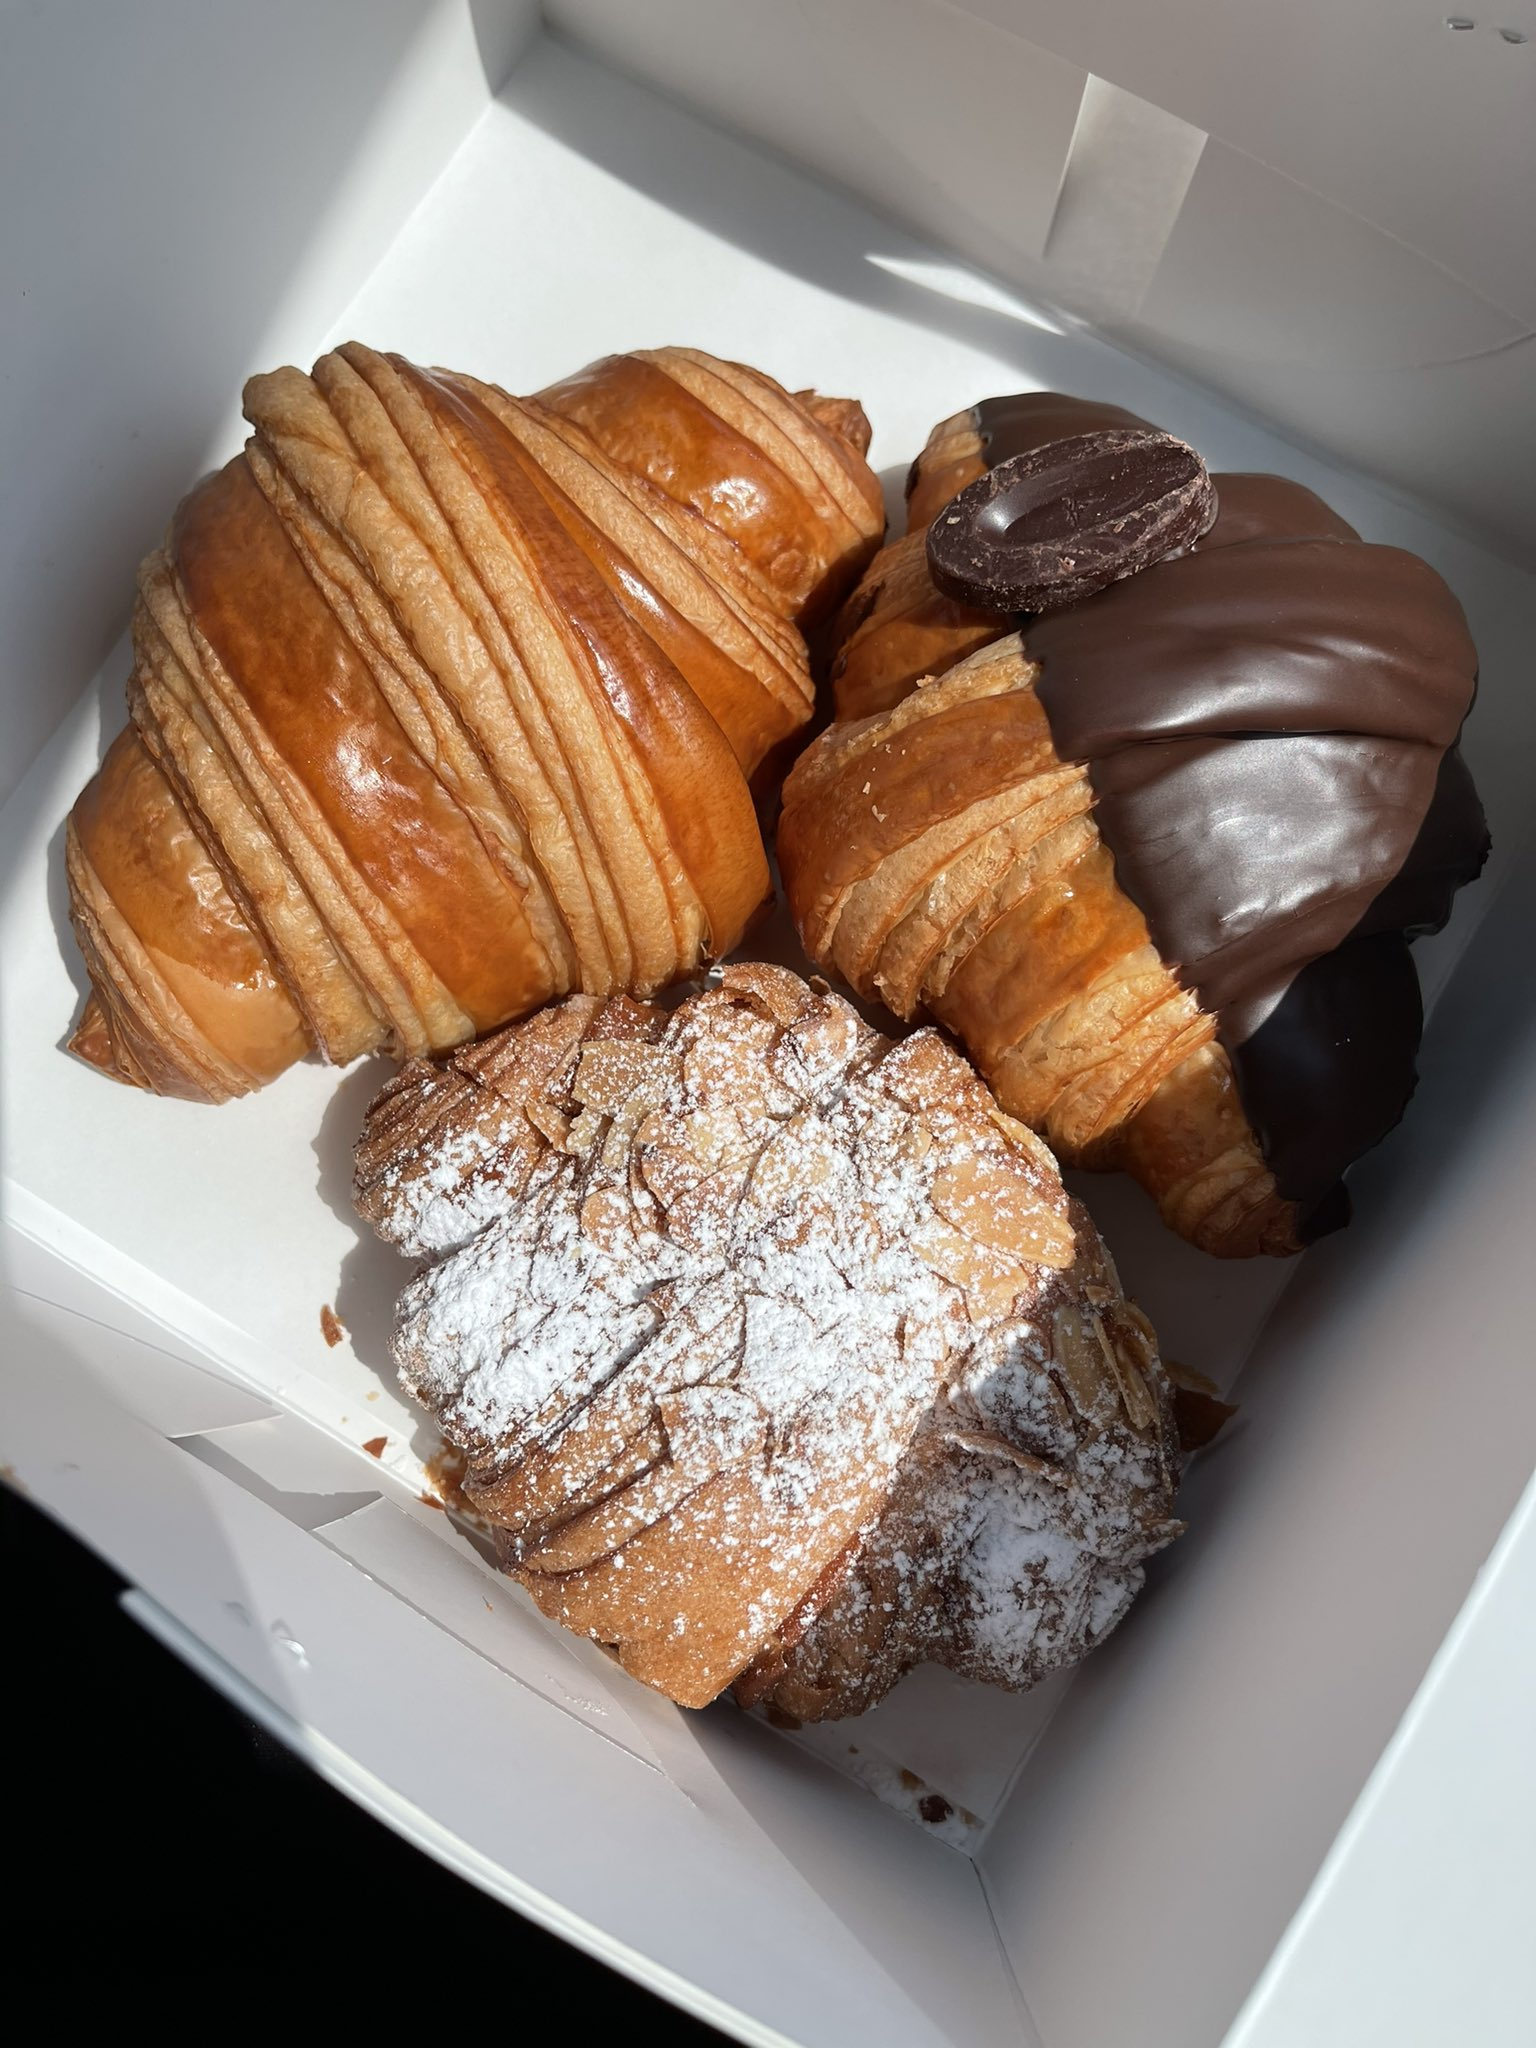 Croissant 1 2 - แนะนำ 7 ร้านครัวซองต์ กรอบนอกนุ่มใน อร่อยทุกคำที่สัมผัส